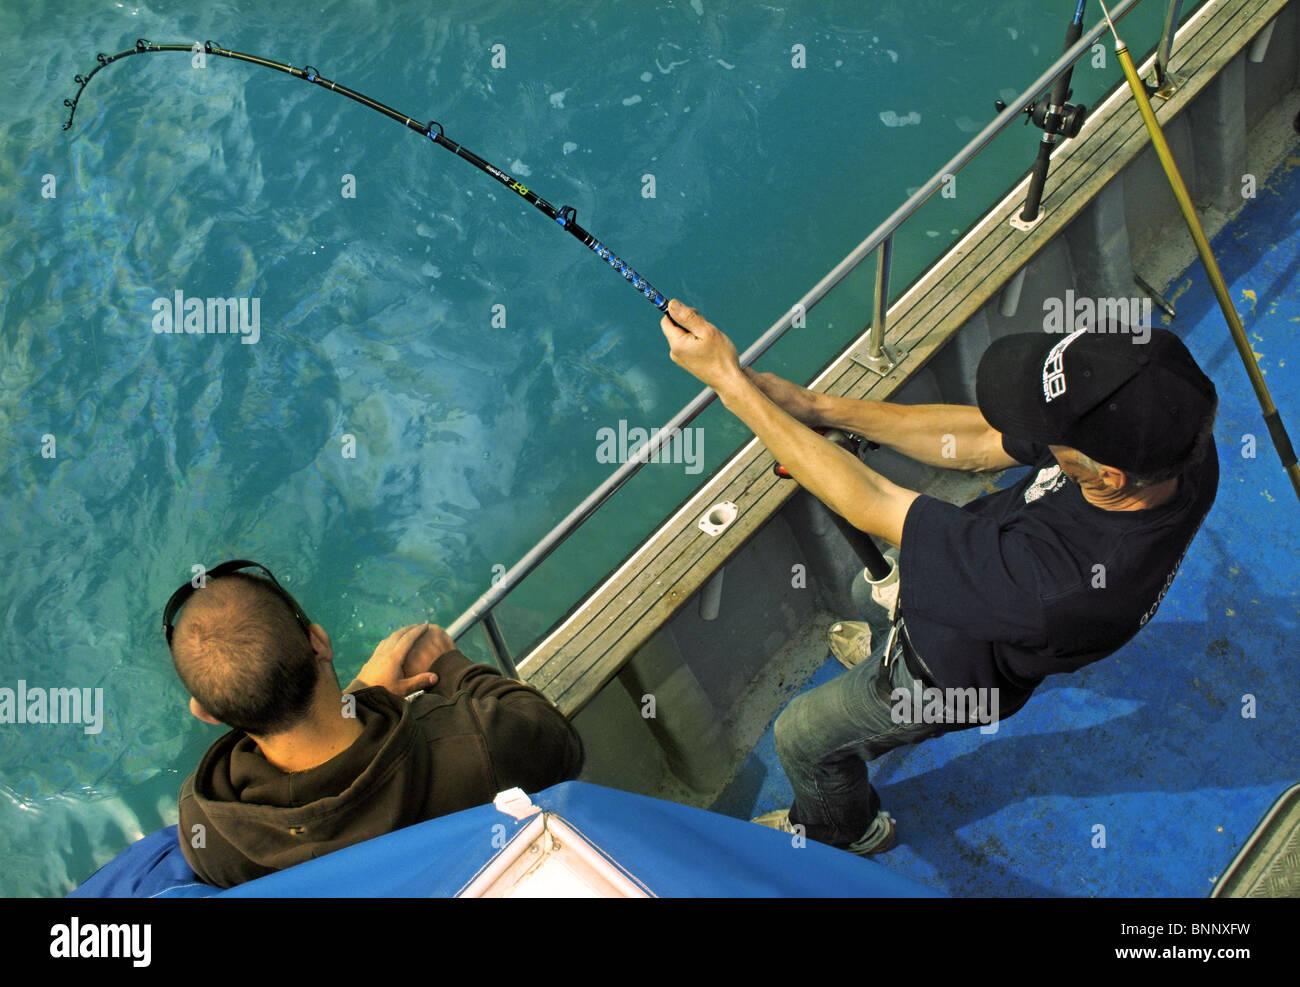 Man deep sea fishing: Big fish on the hook bends the rod. - Stock Image